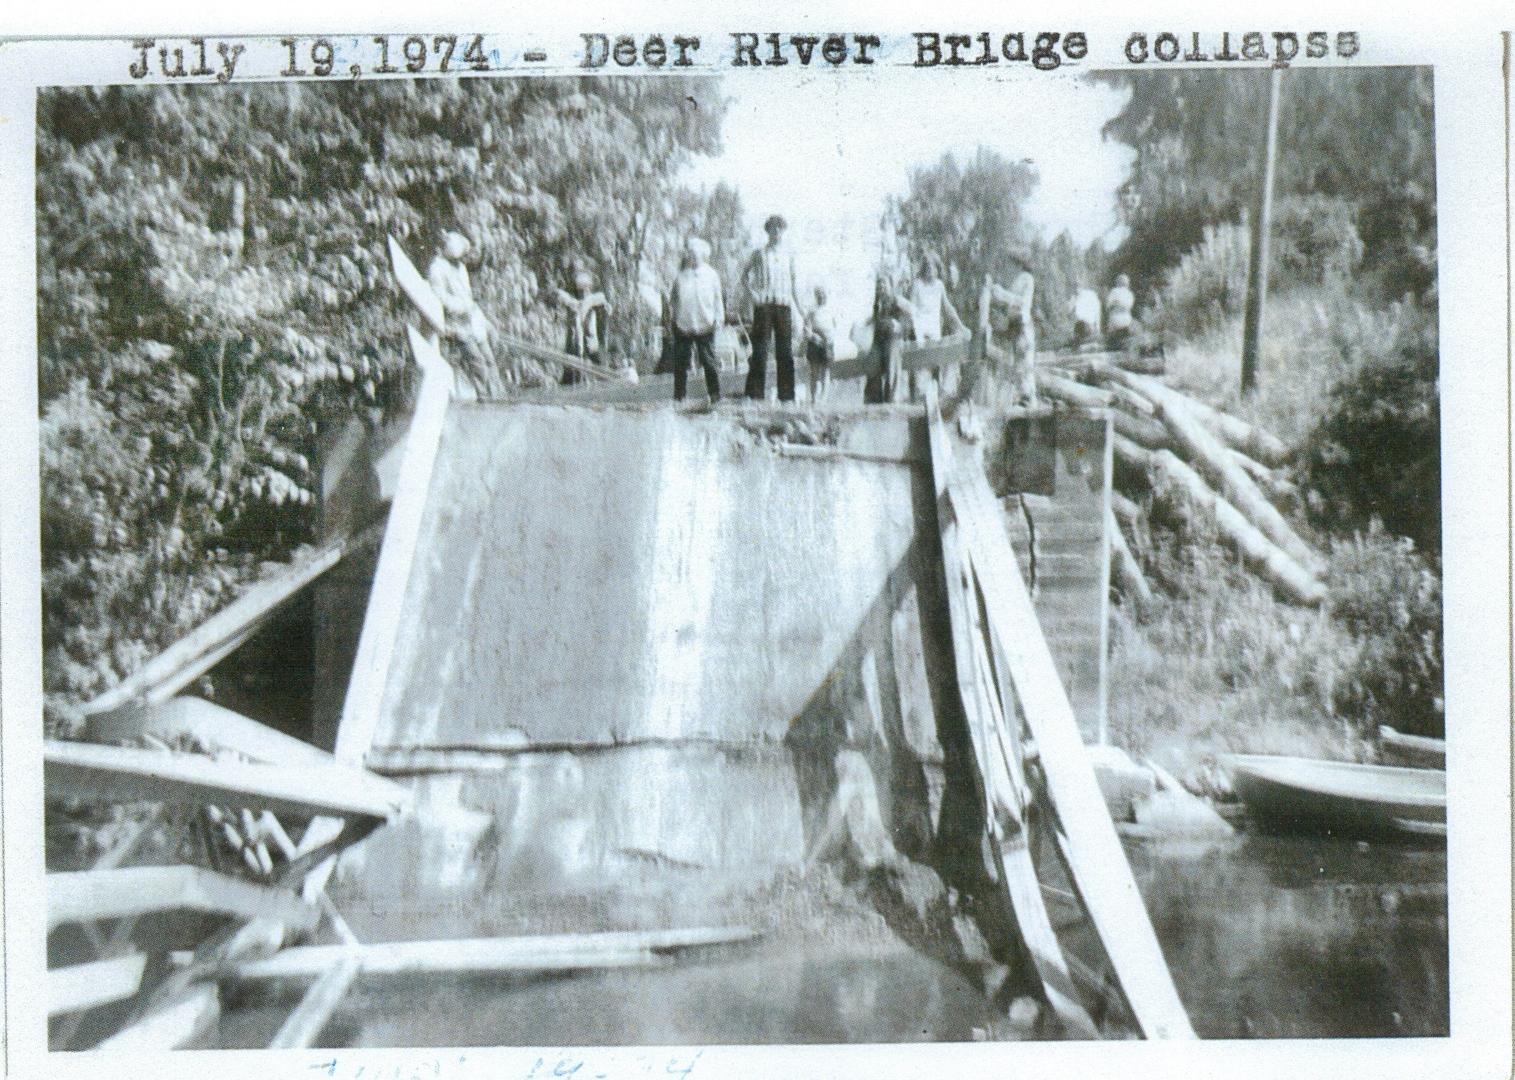 Deer River Stephen & Allan Fehrenbach July 19 1974.jpg